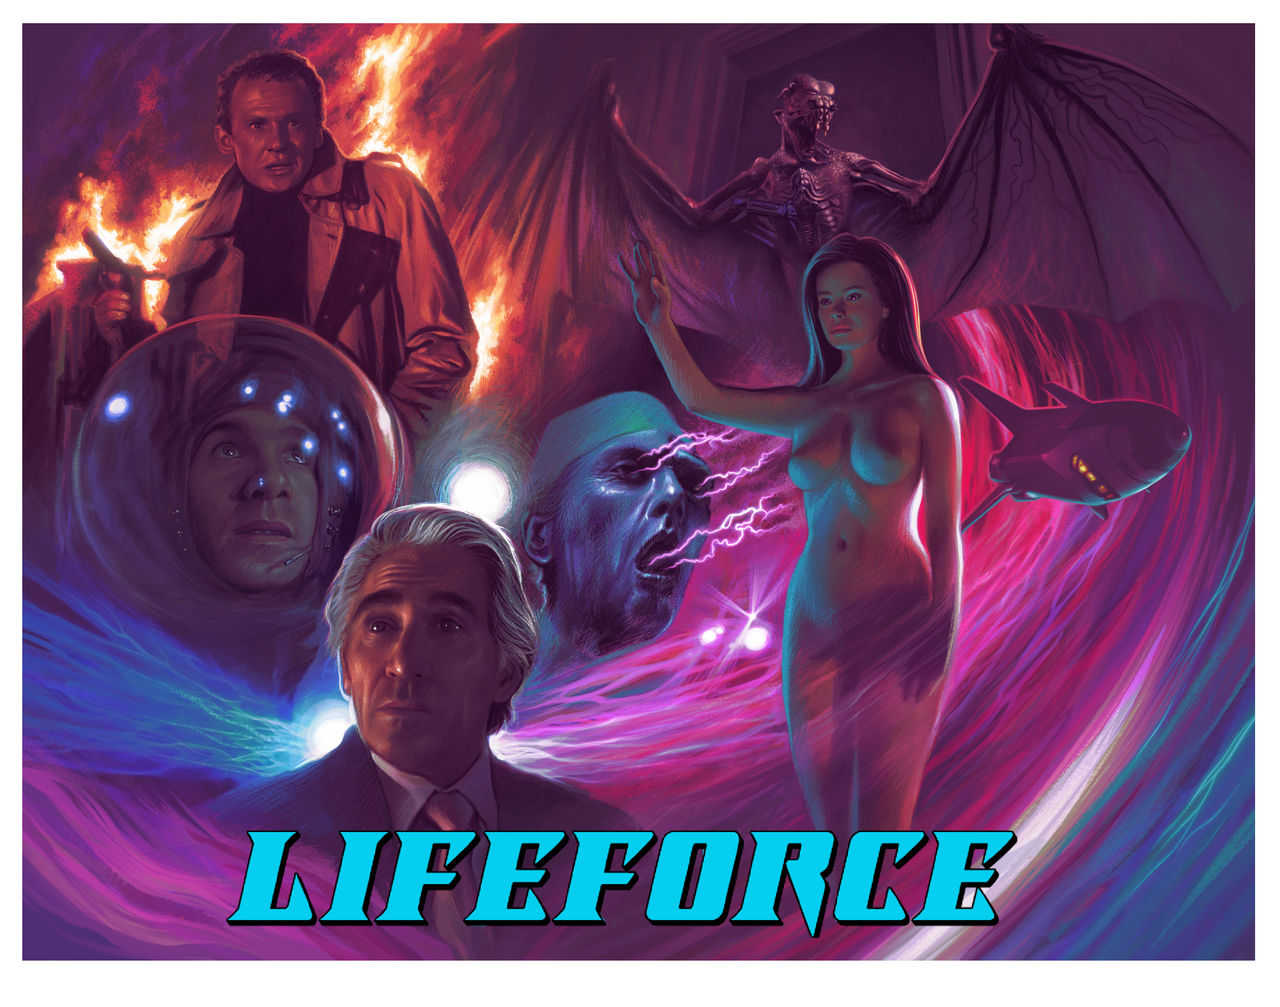 May lifeforce mathilda Lifeforce (film)